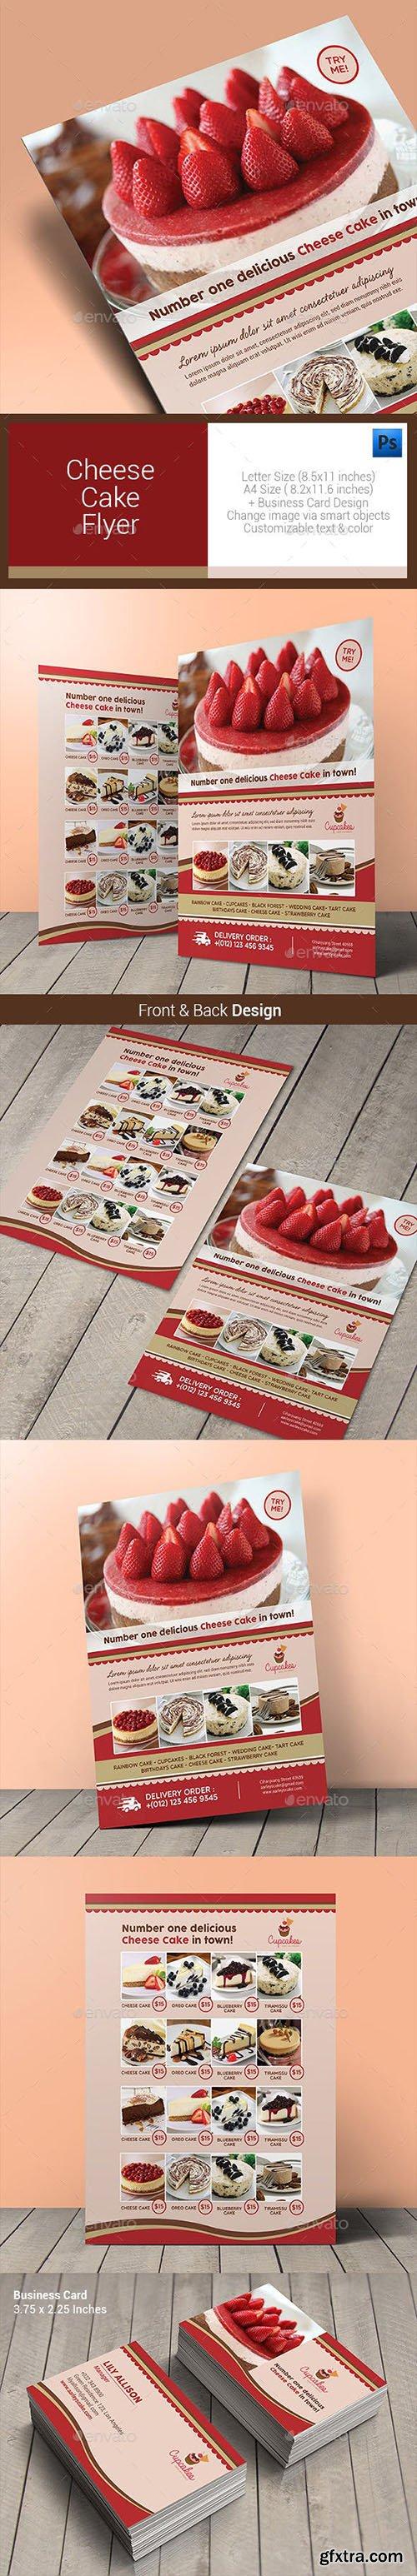 Cheese Cake Menu Flyer 10640856